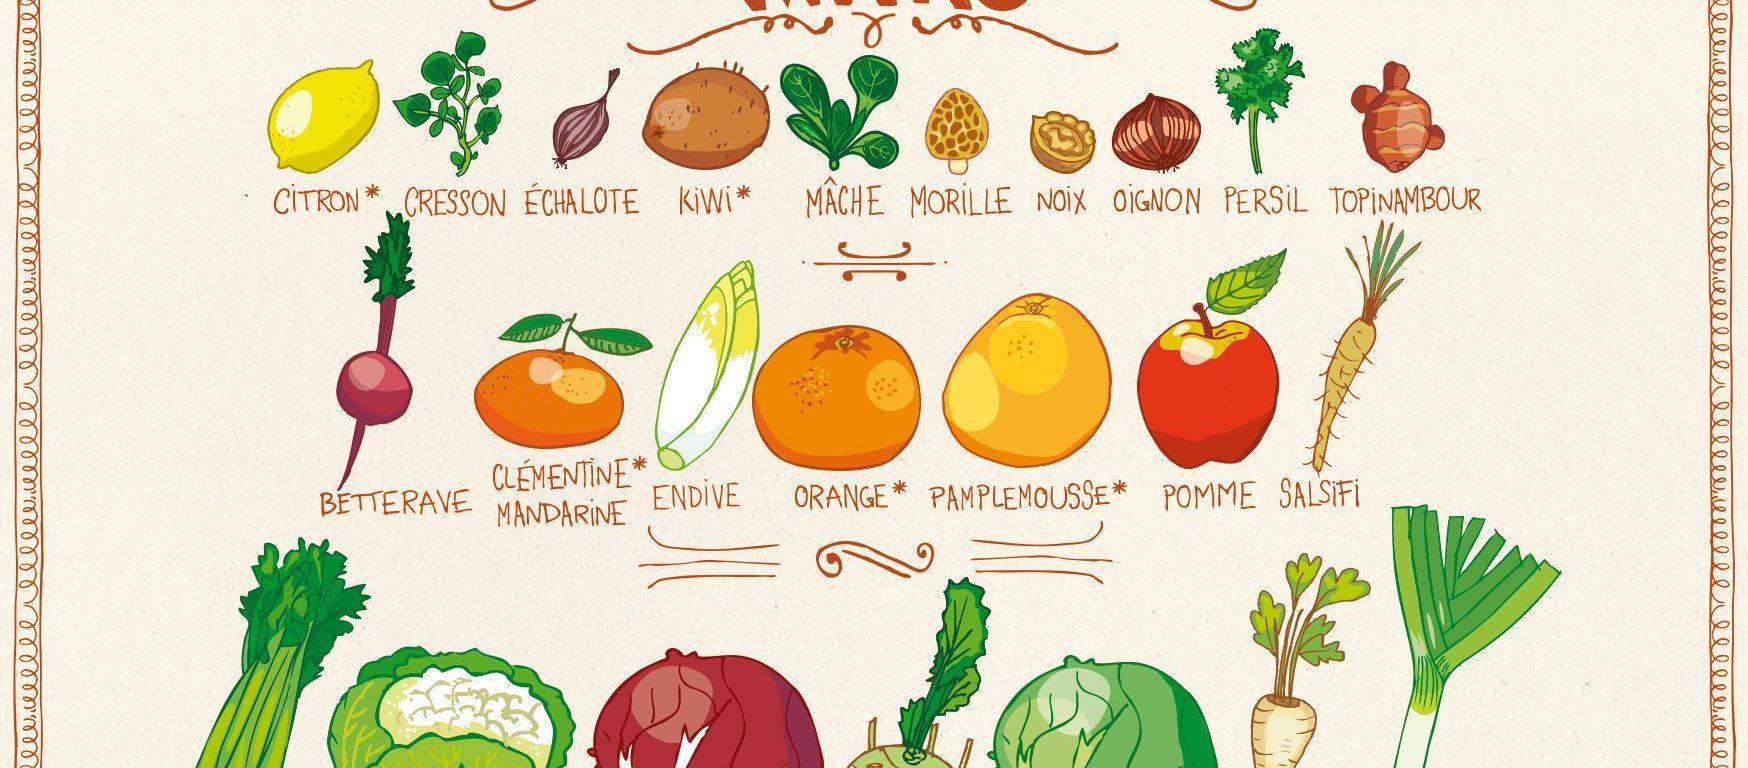 Fruits et légumes de Mars de La-Table-de-Liz